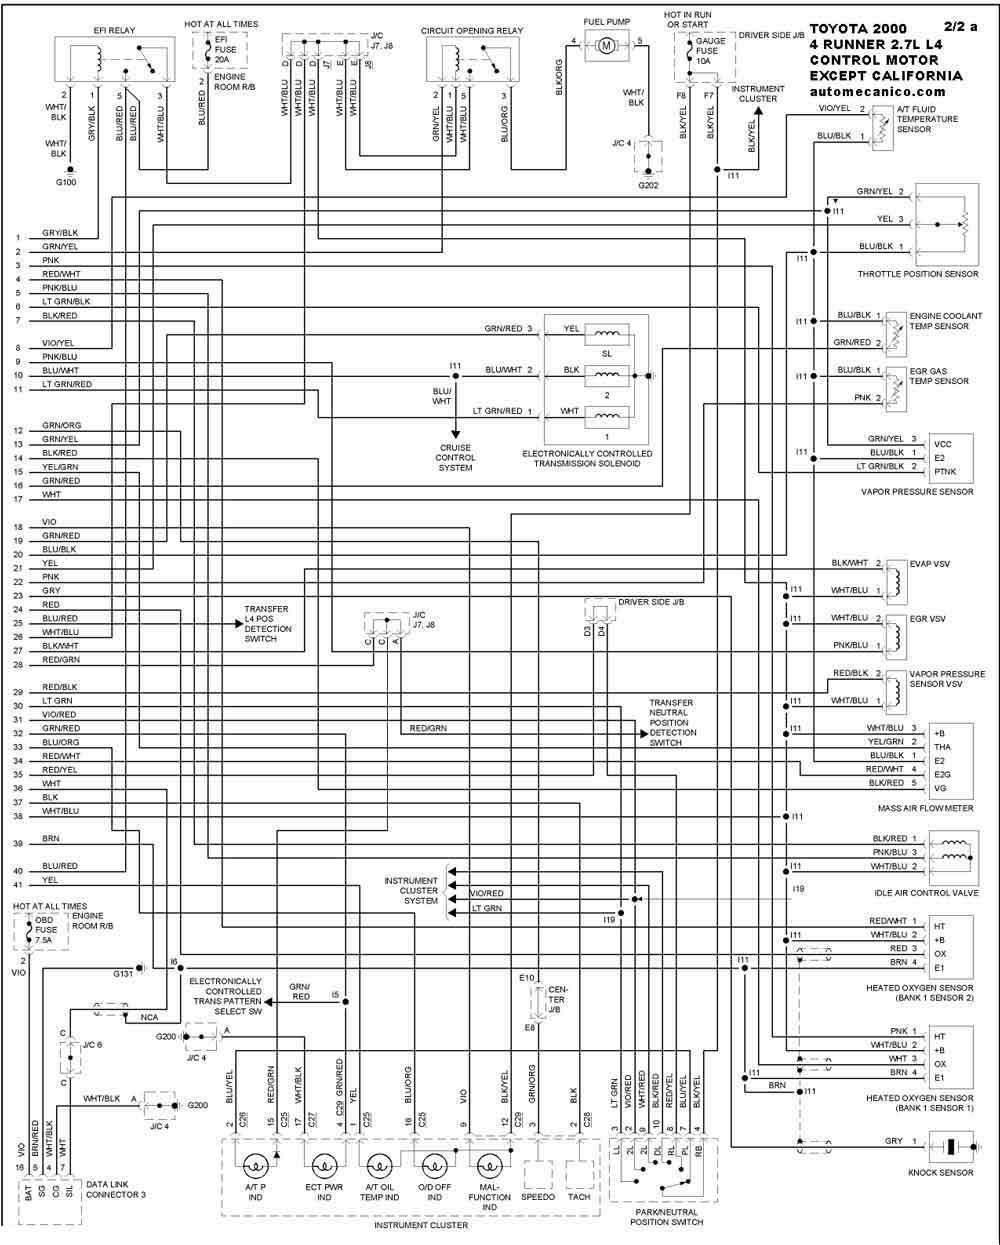 toyota 2000 - diagramas control del motor - graphics - esquemas